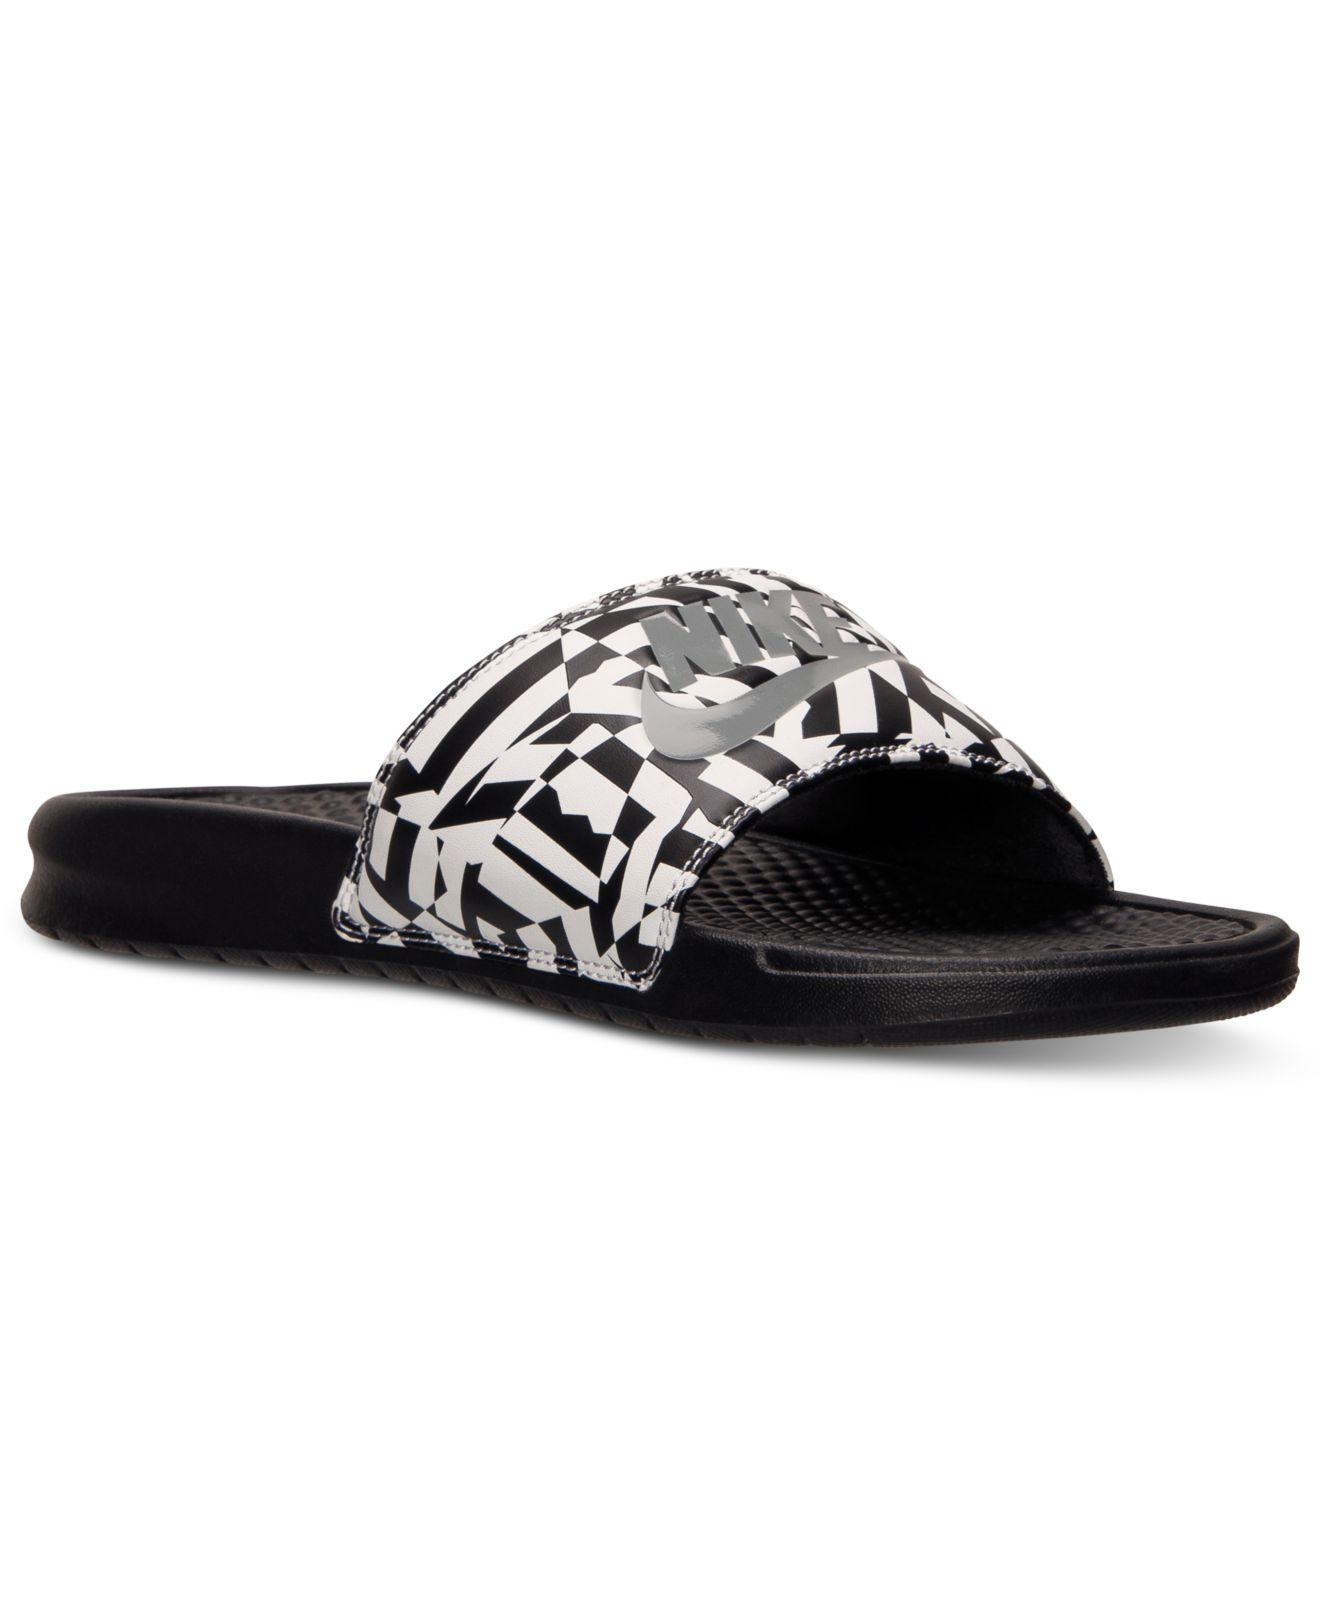 efe69d44e Nike Men'S Benassi Jdi Print Slide Sandals From Finish Line in Black ...